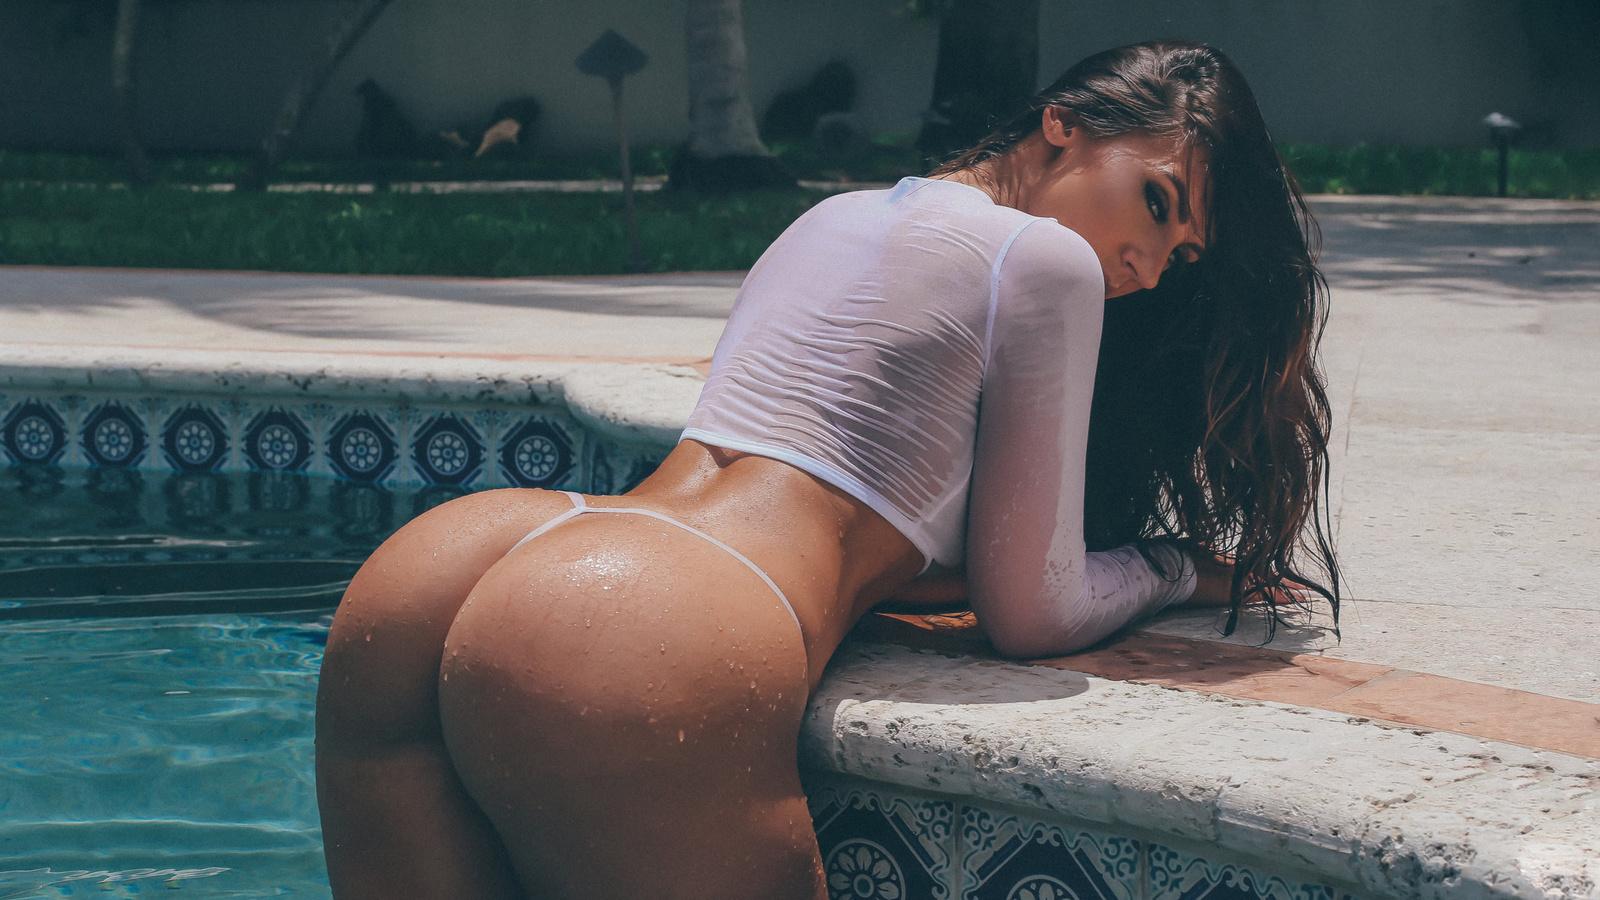 amanda cherundolo, модель, попа, бассейн, мокрая, взгляд